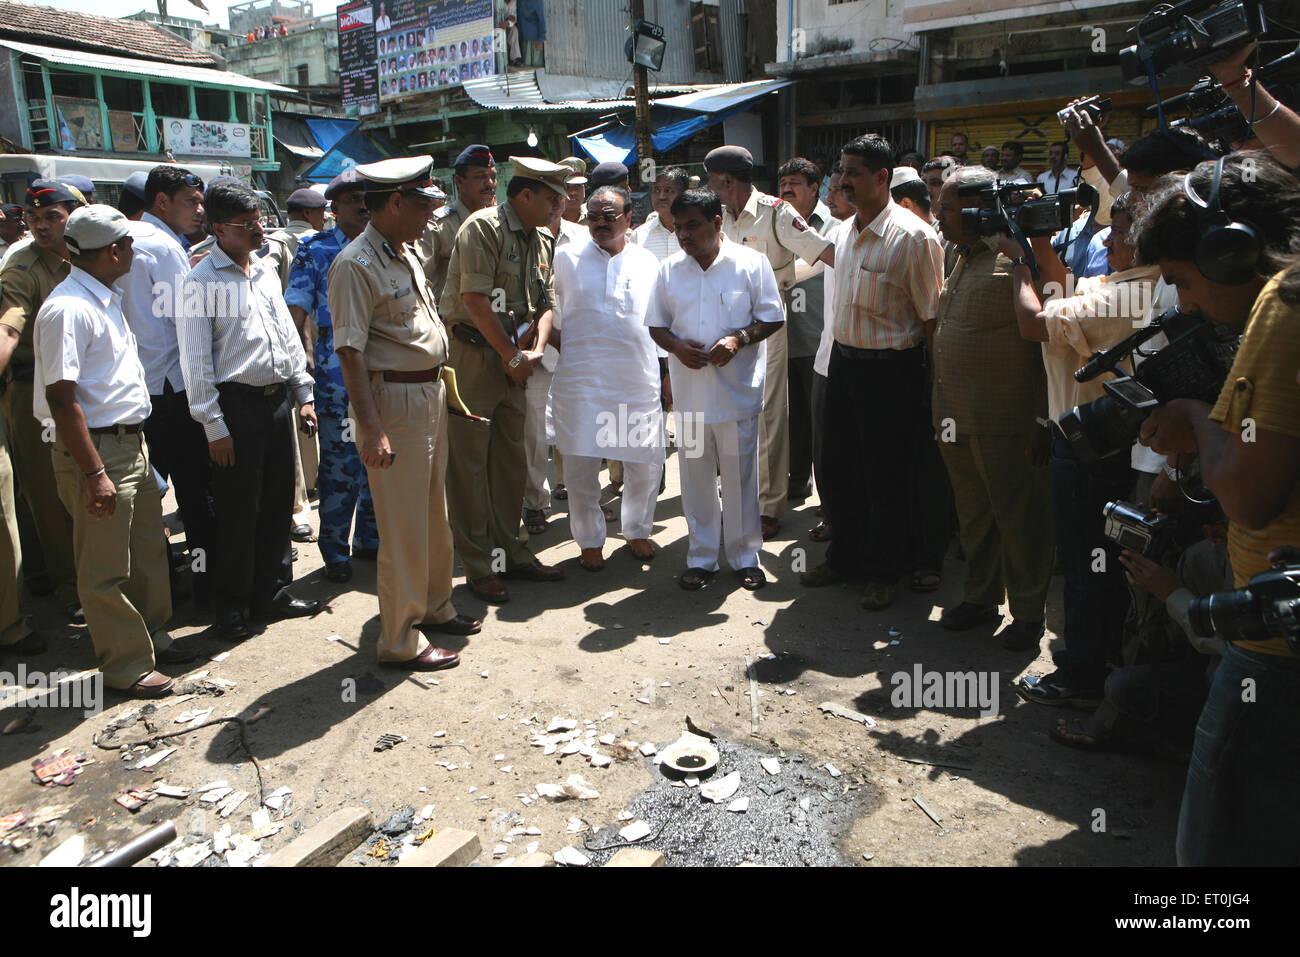 Guardian ministre de M. Chhagan Bhujbal district de Nasik bombe rocked Malegaon 29 Septembre 2008 Photo Stock